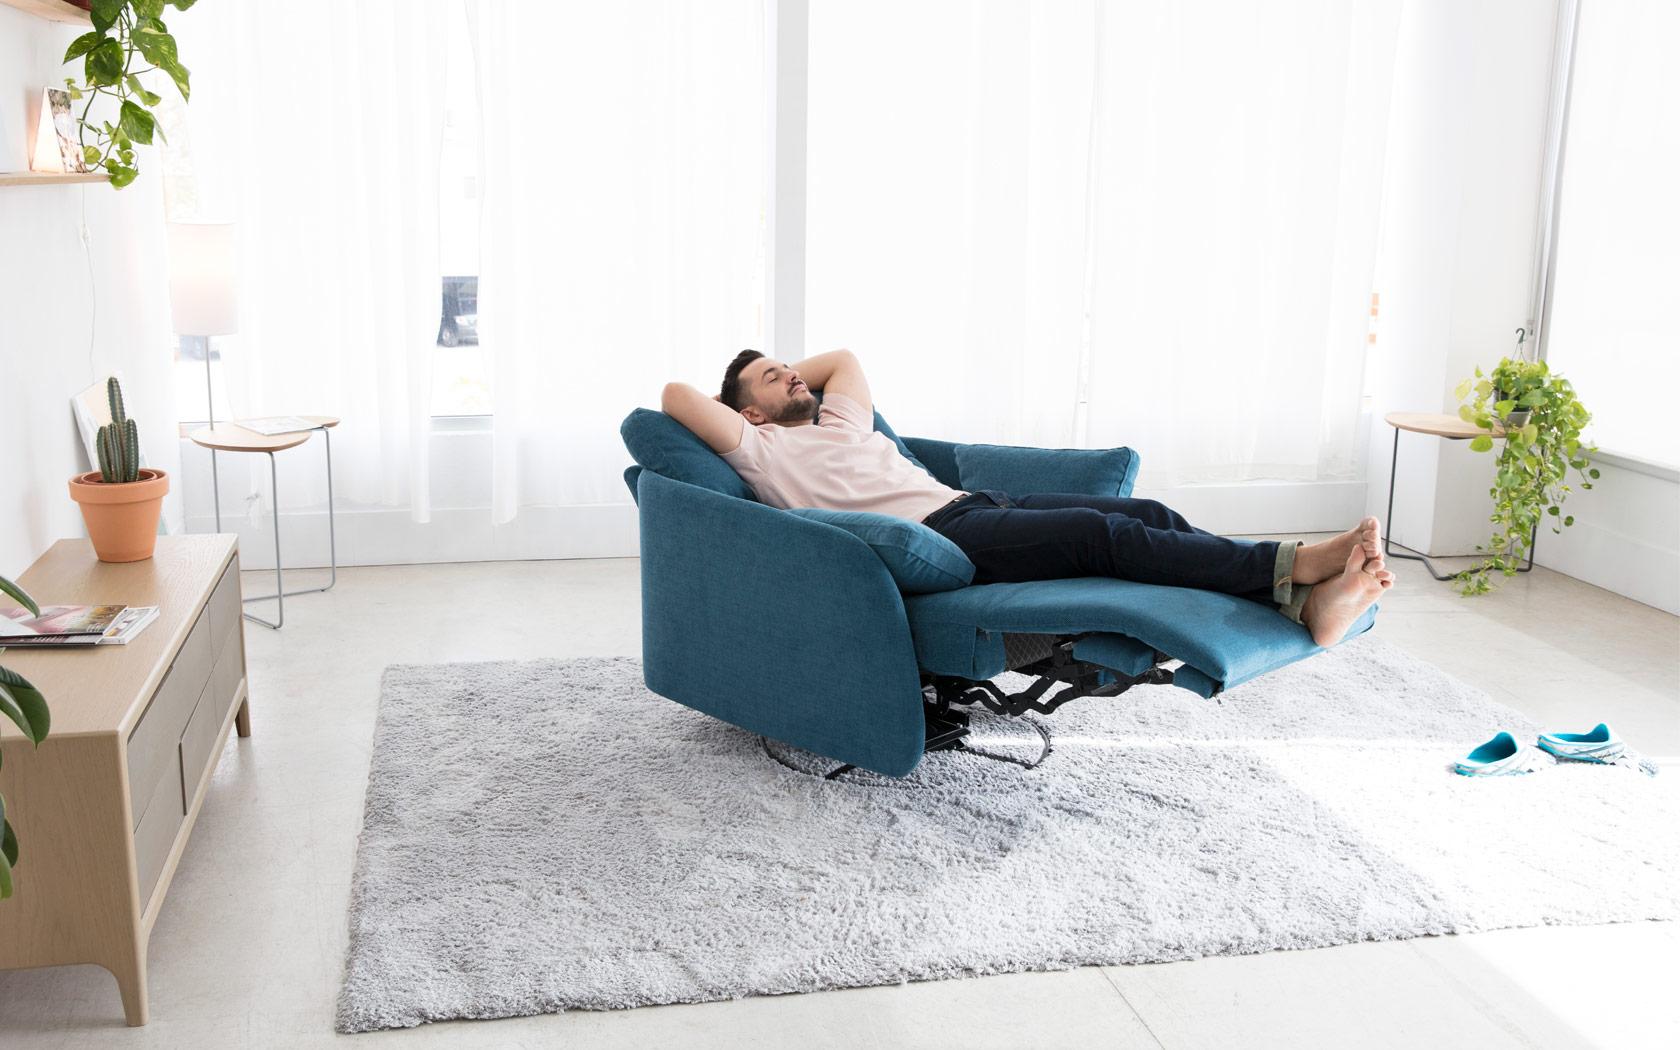 Adan sillon relax 2020 01